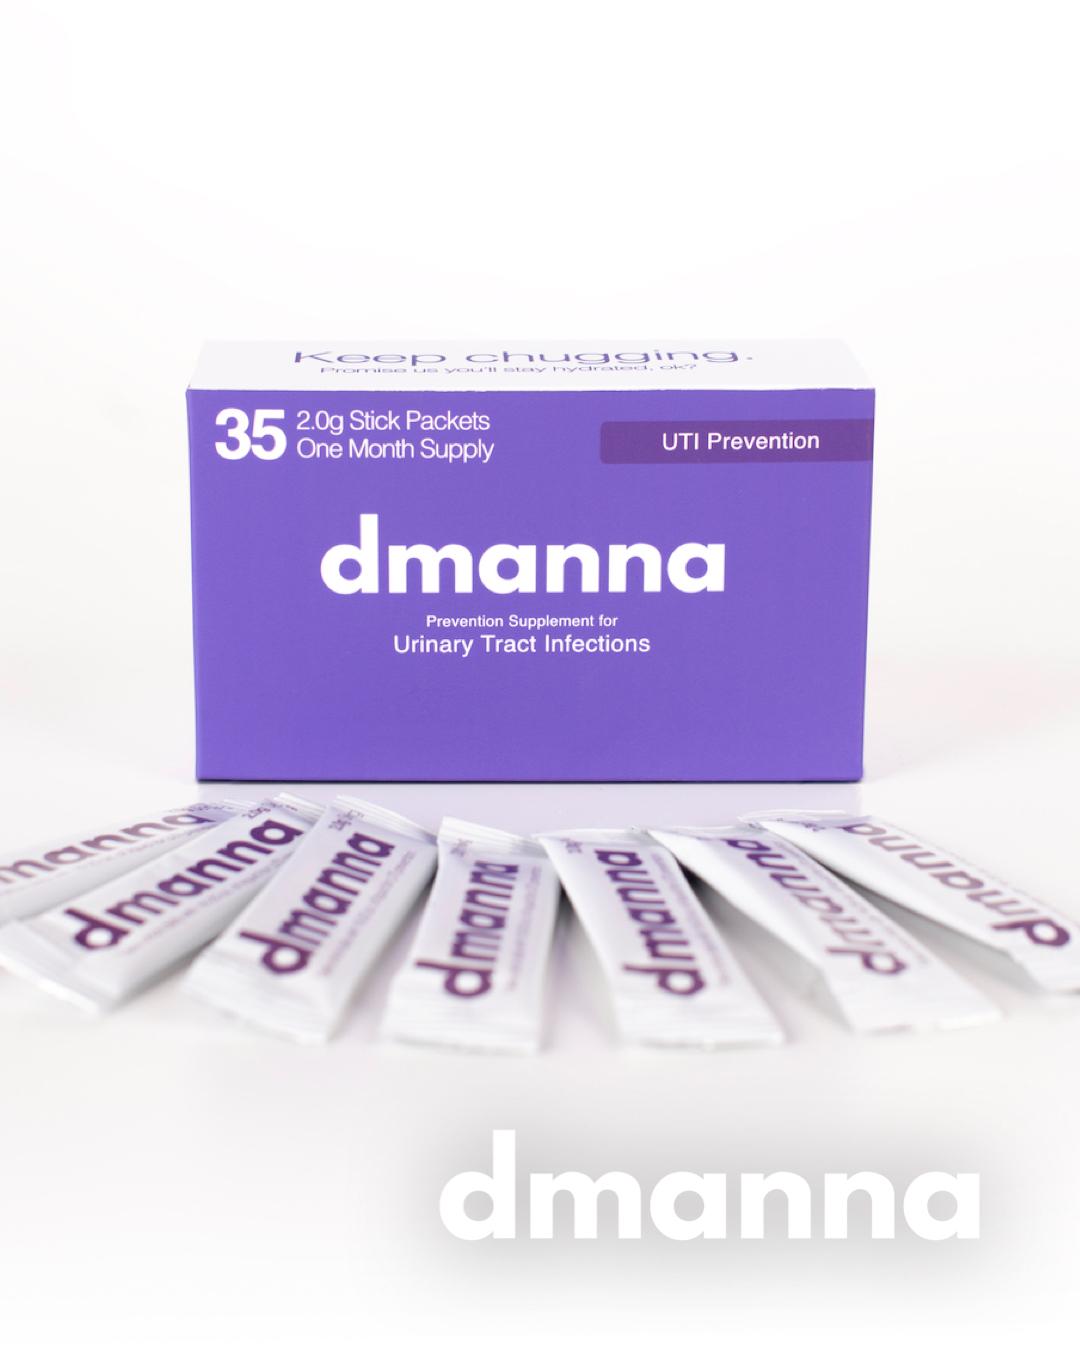 Dmanna_West 2019 - Headshots.001.jpeg